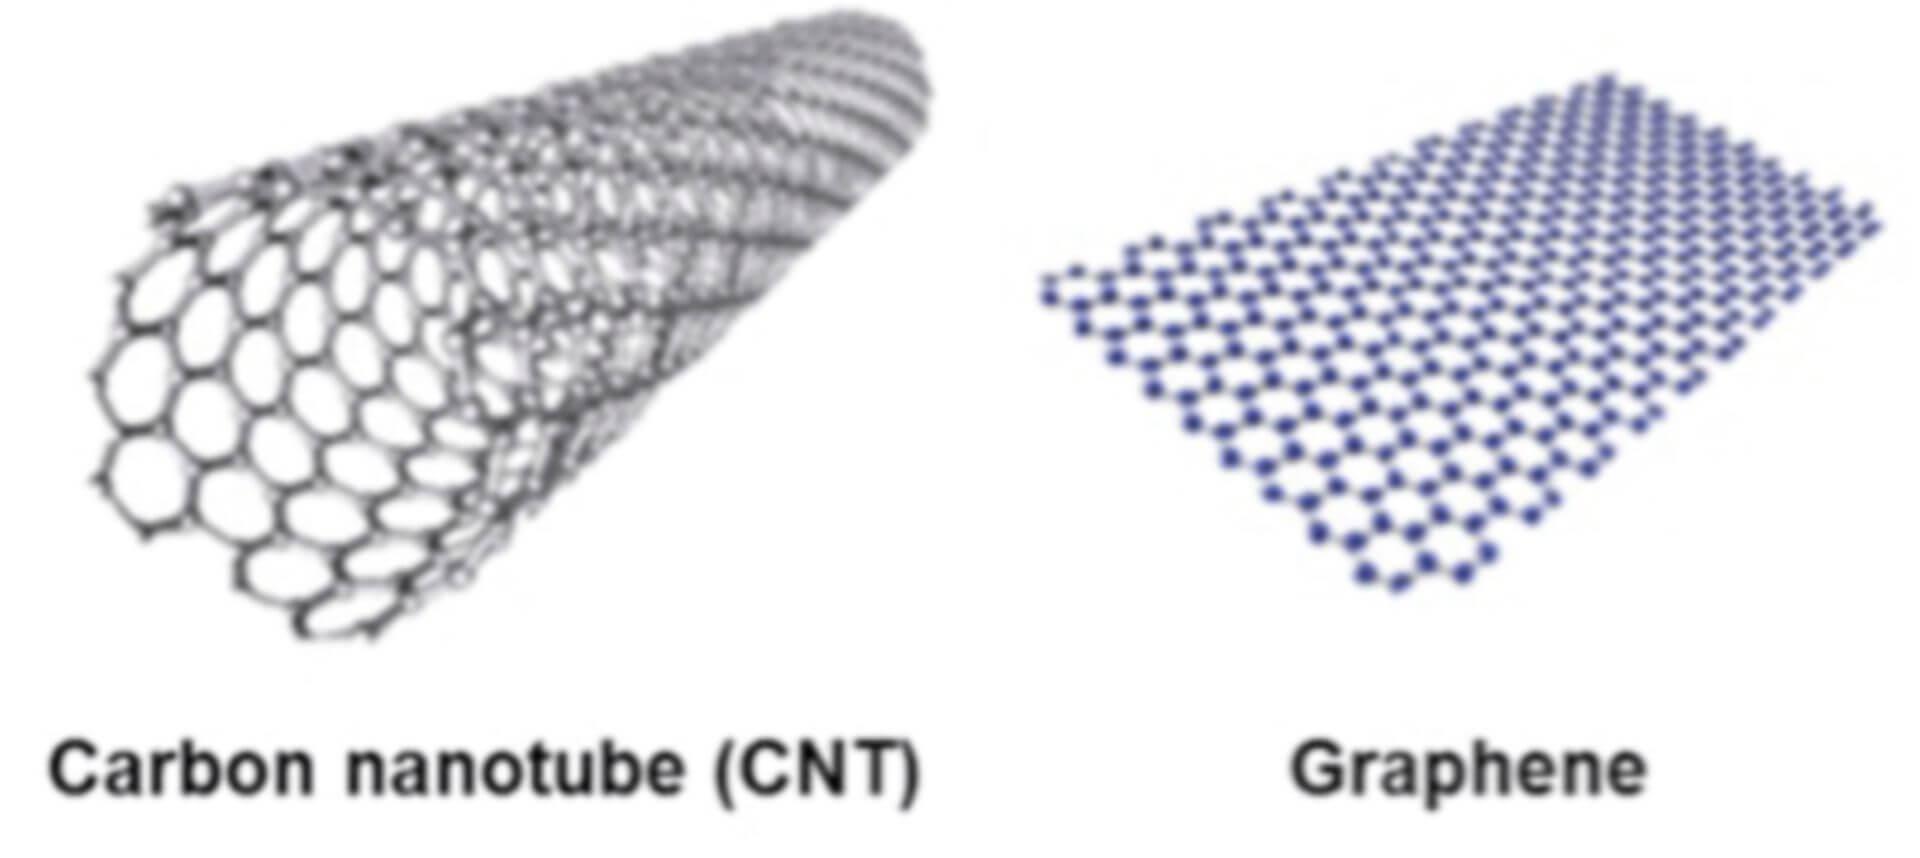 Graphene and Carbon Nanotube